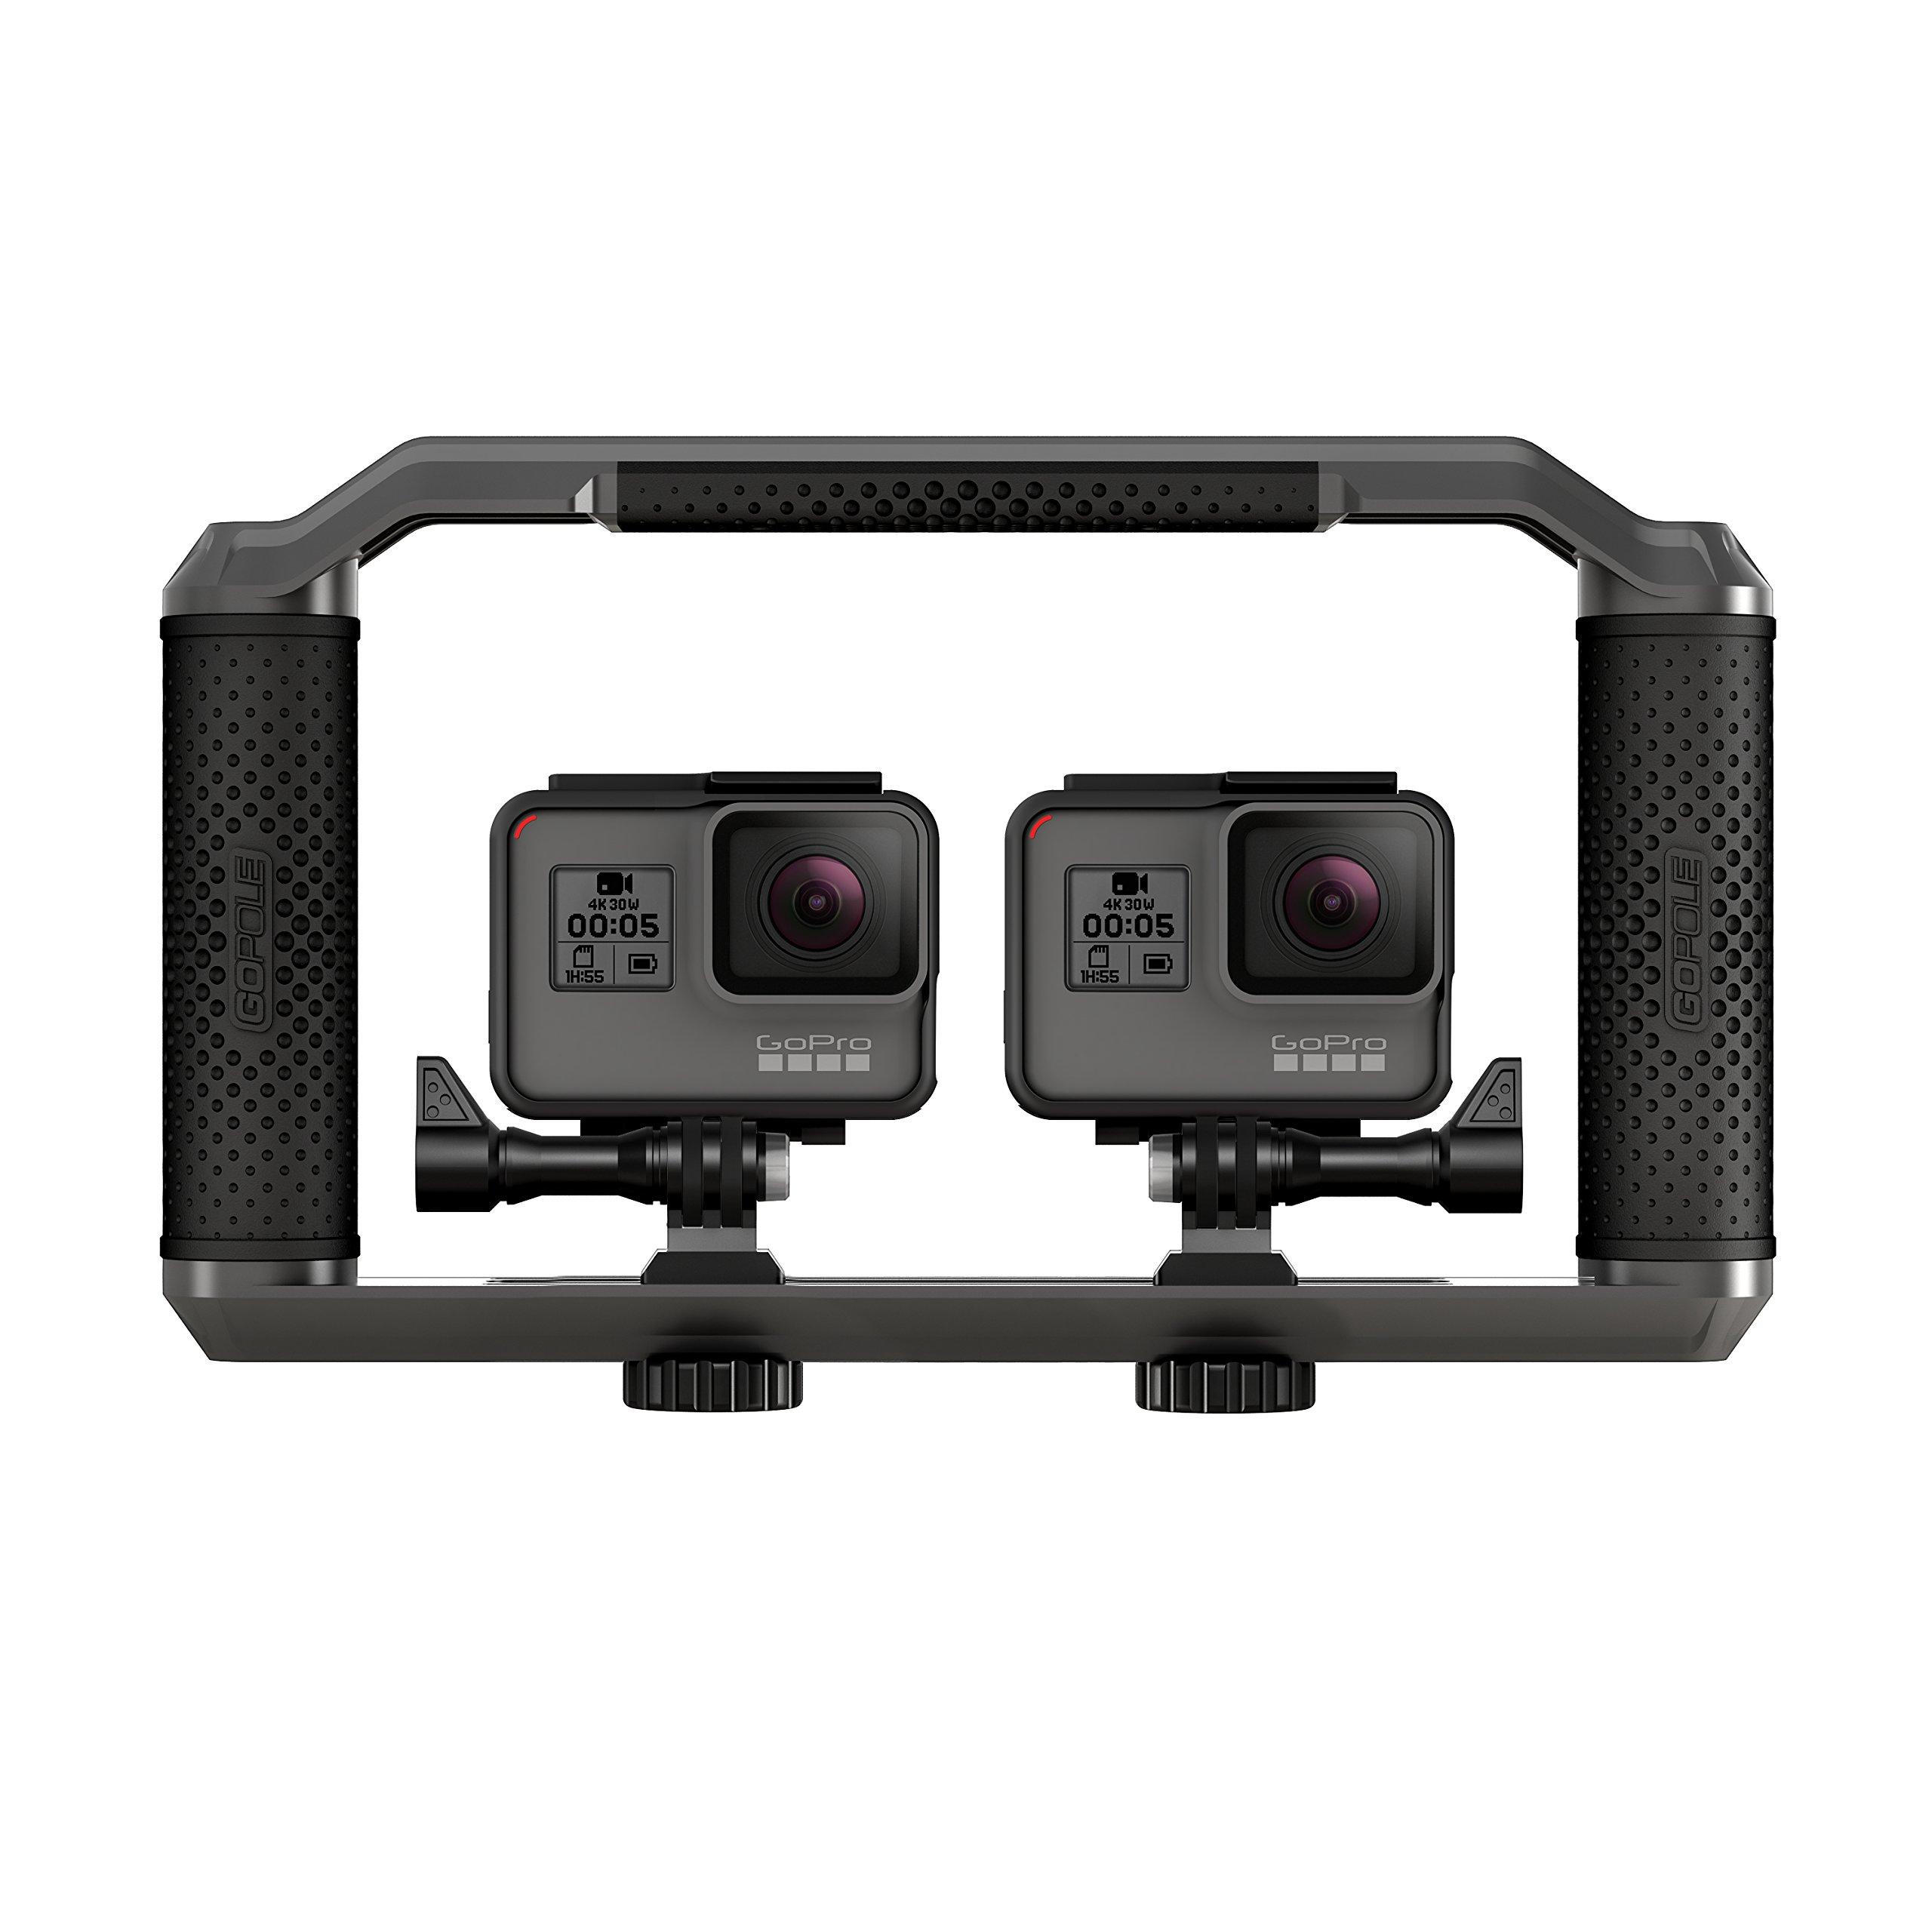 GoPole Triad Grip - Multi-Configuration Tray for GoPro Cameras